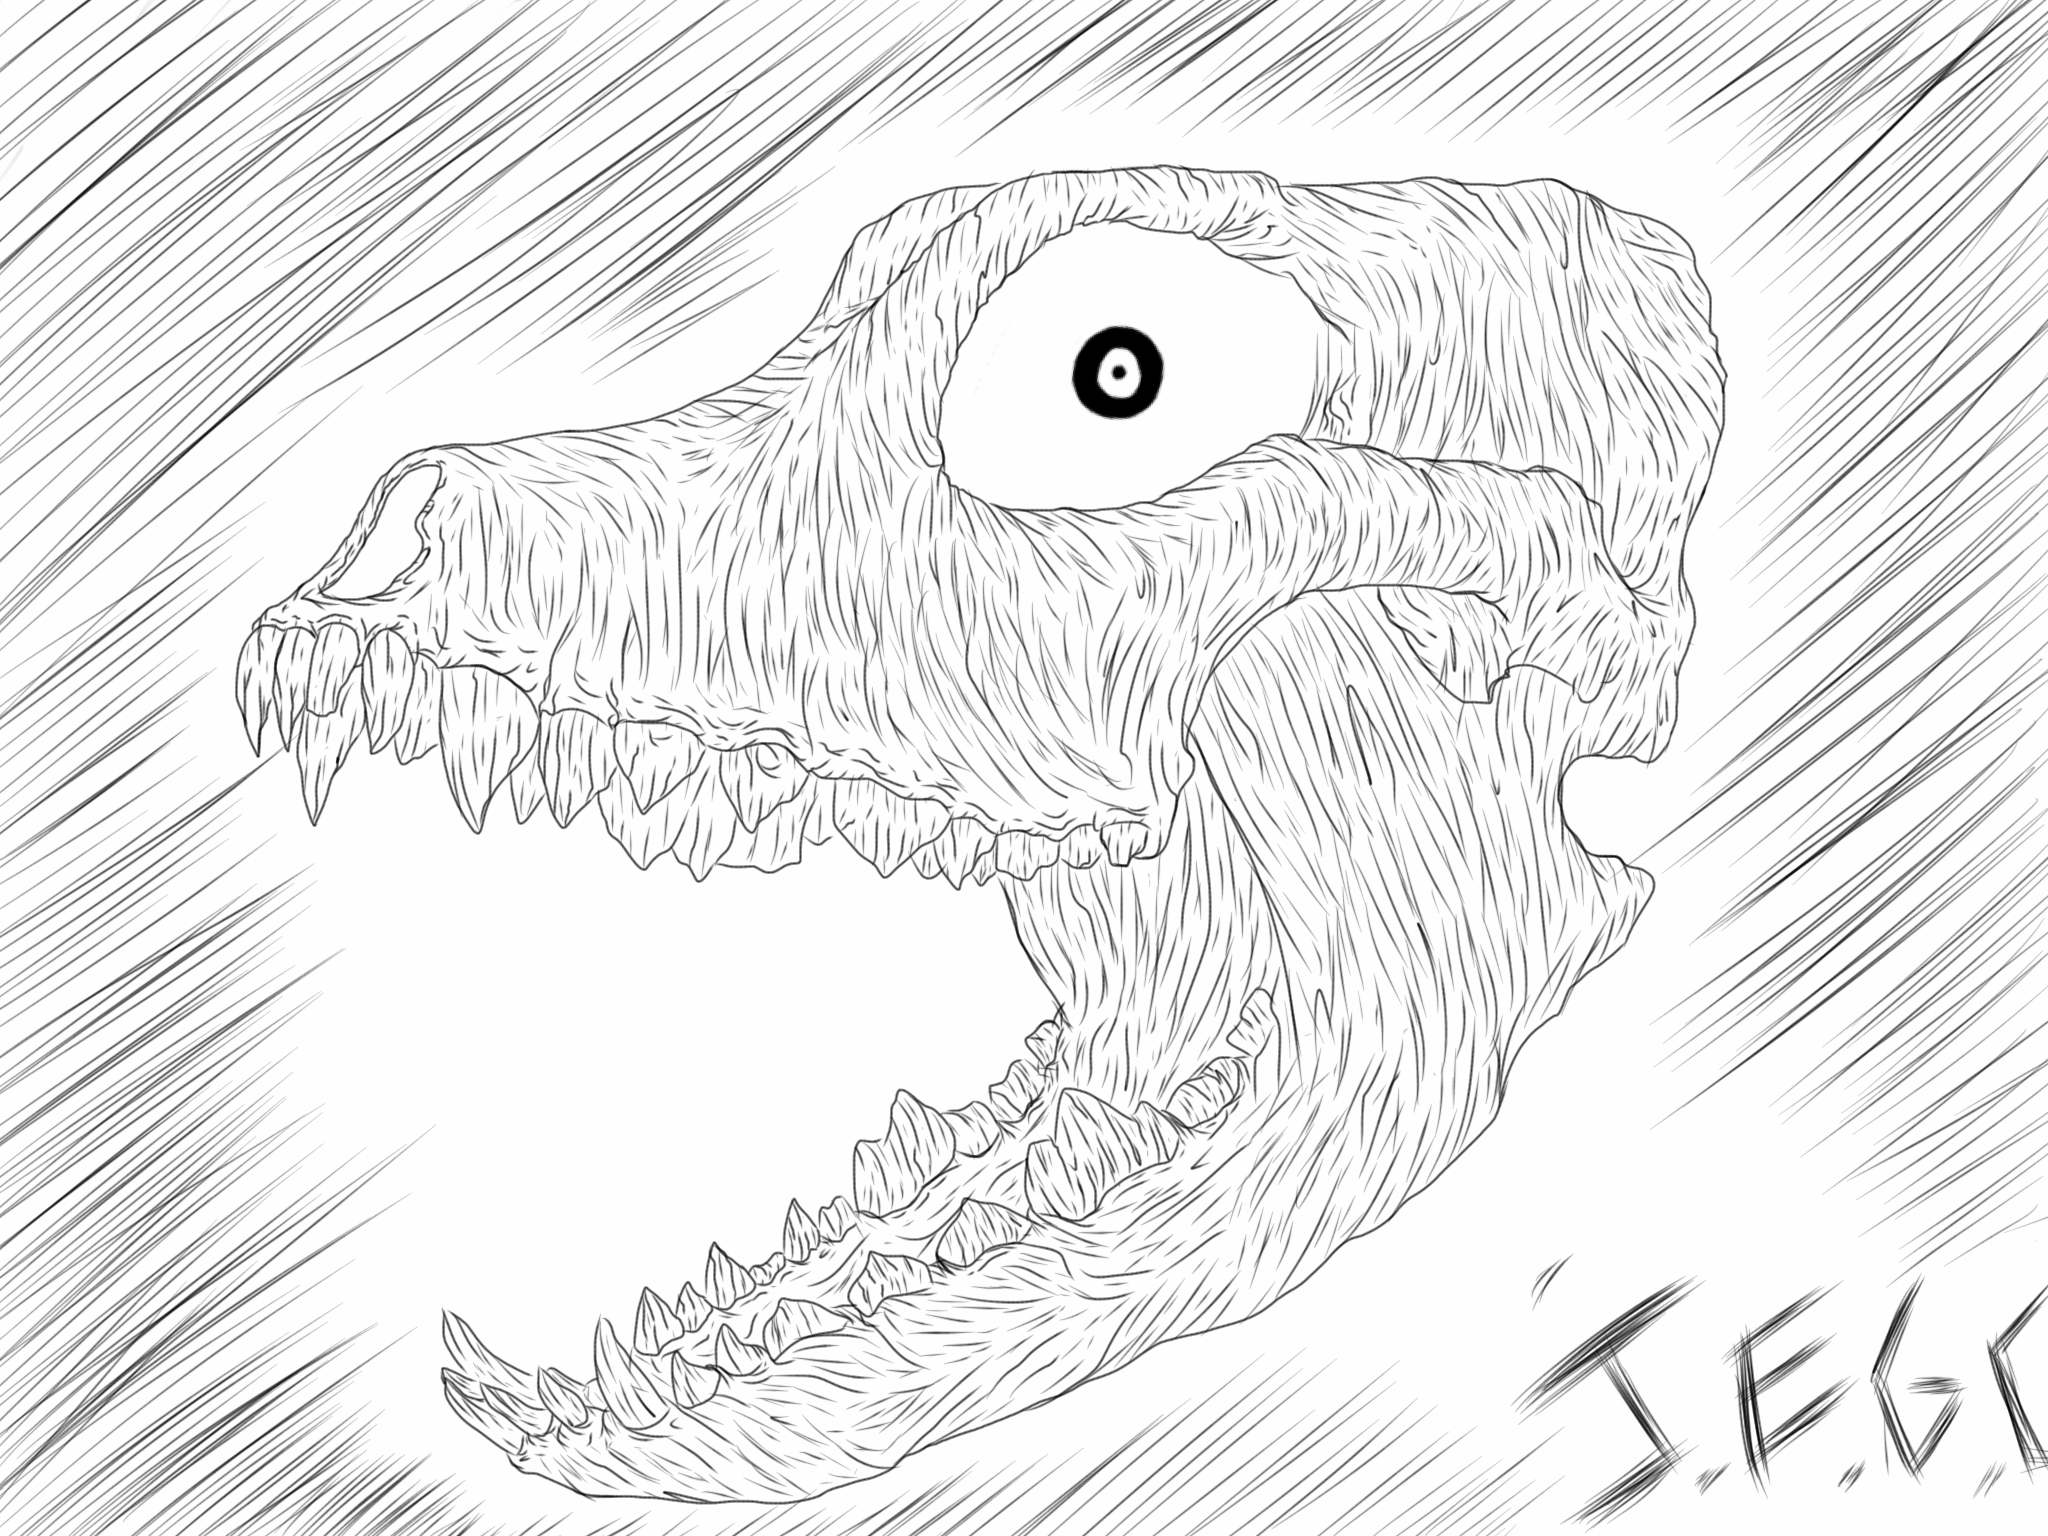 Doggy skull by jjjjoooo1234